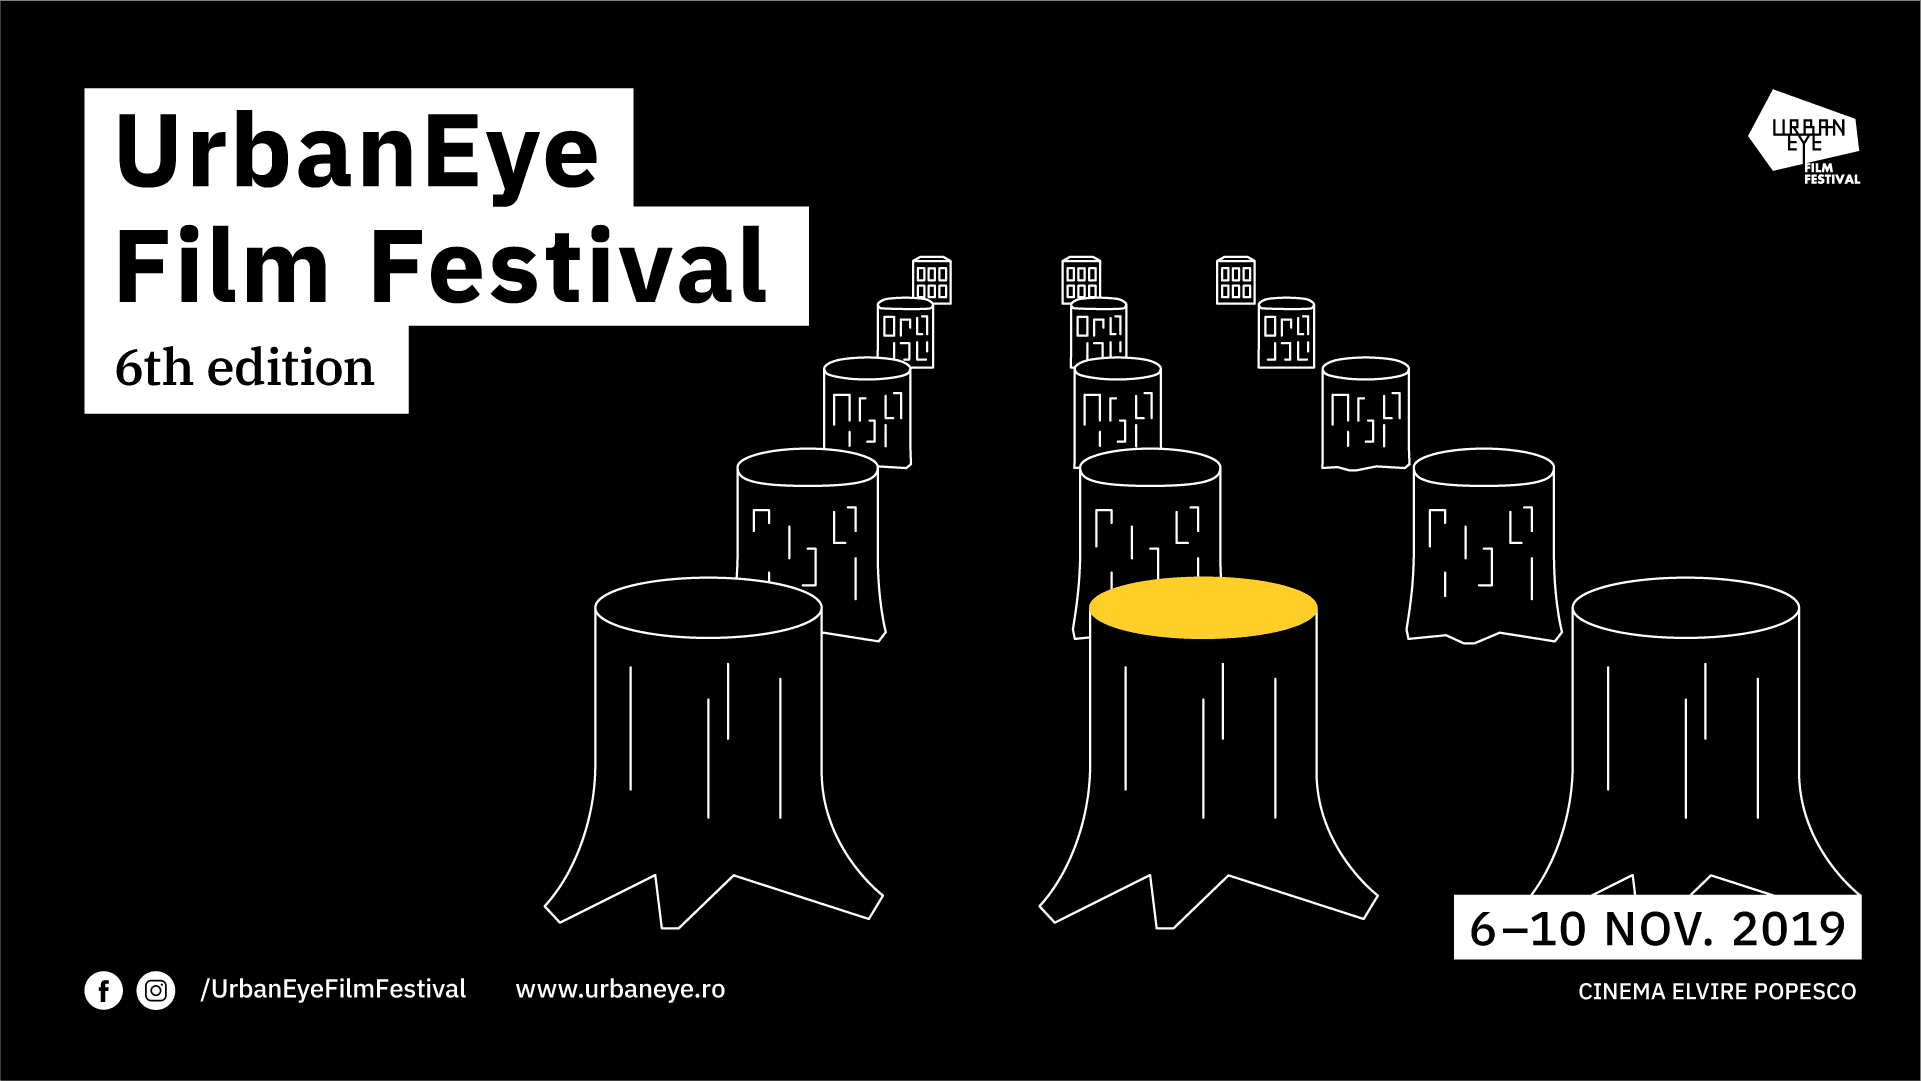 UrbanEye Film Festival 2019